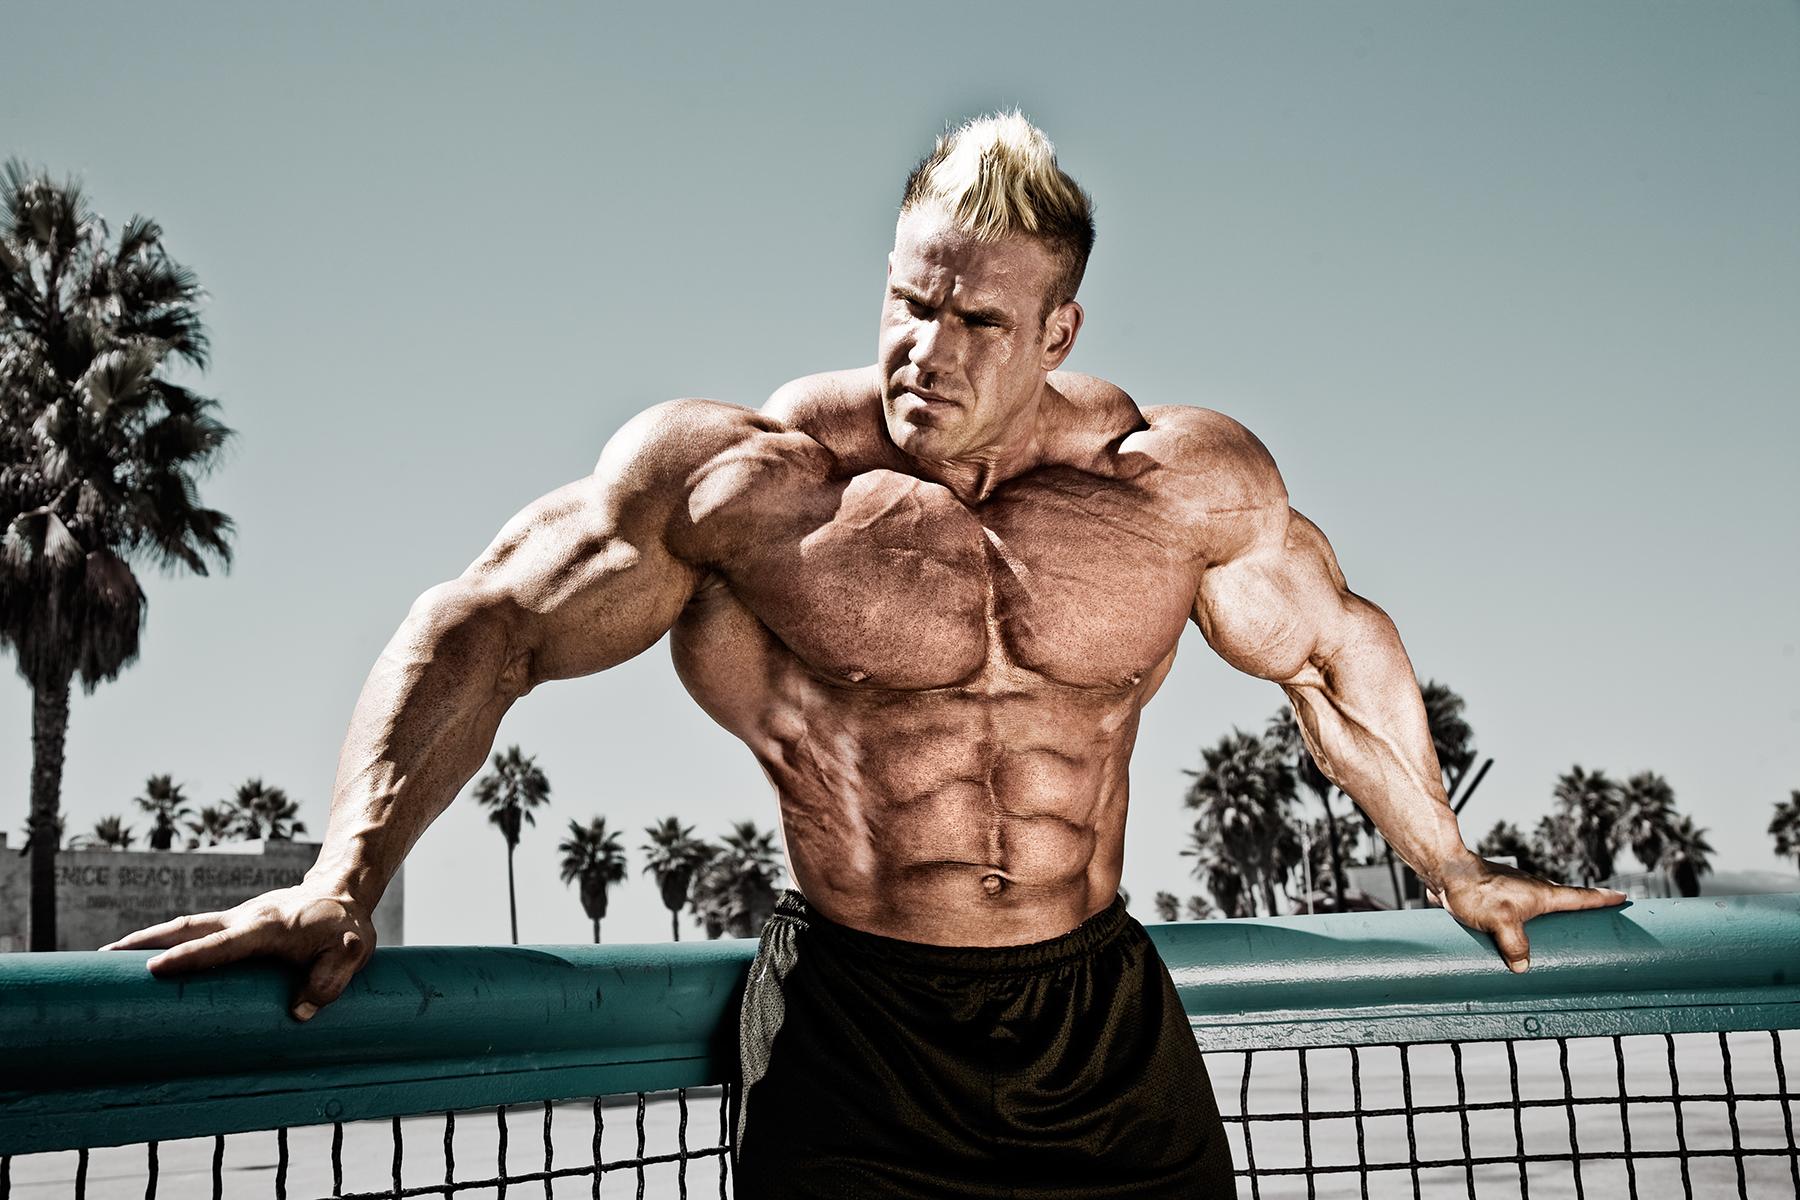 4K Bodybuilder Wallpaper